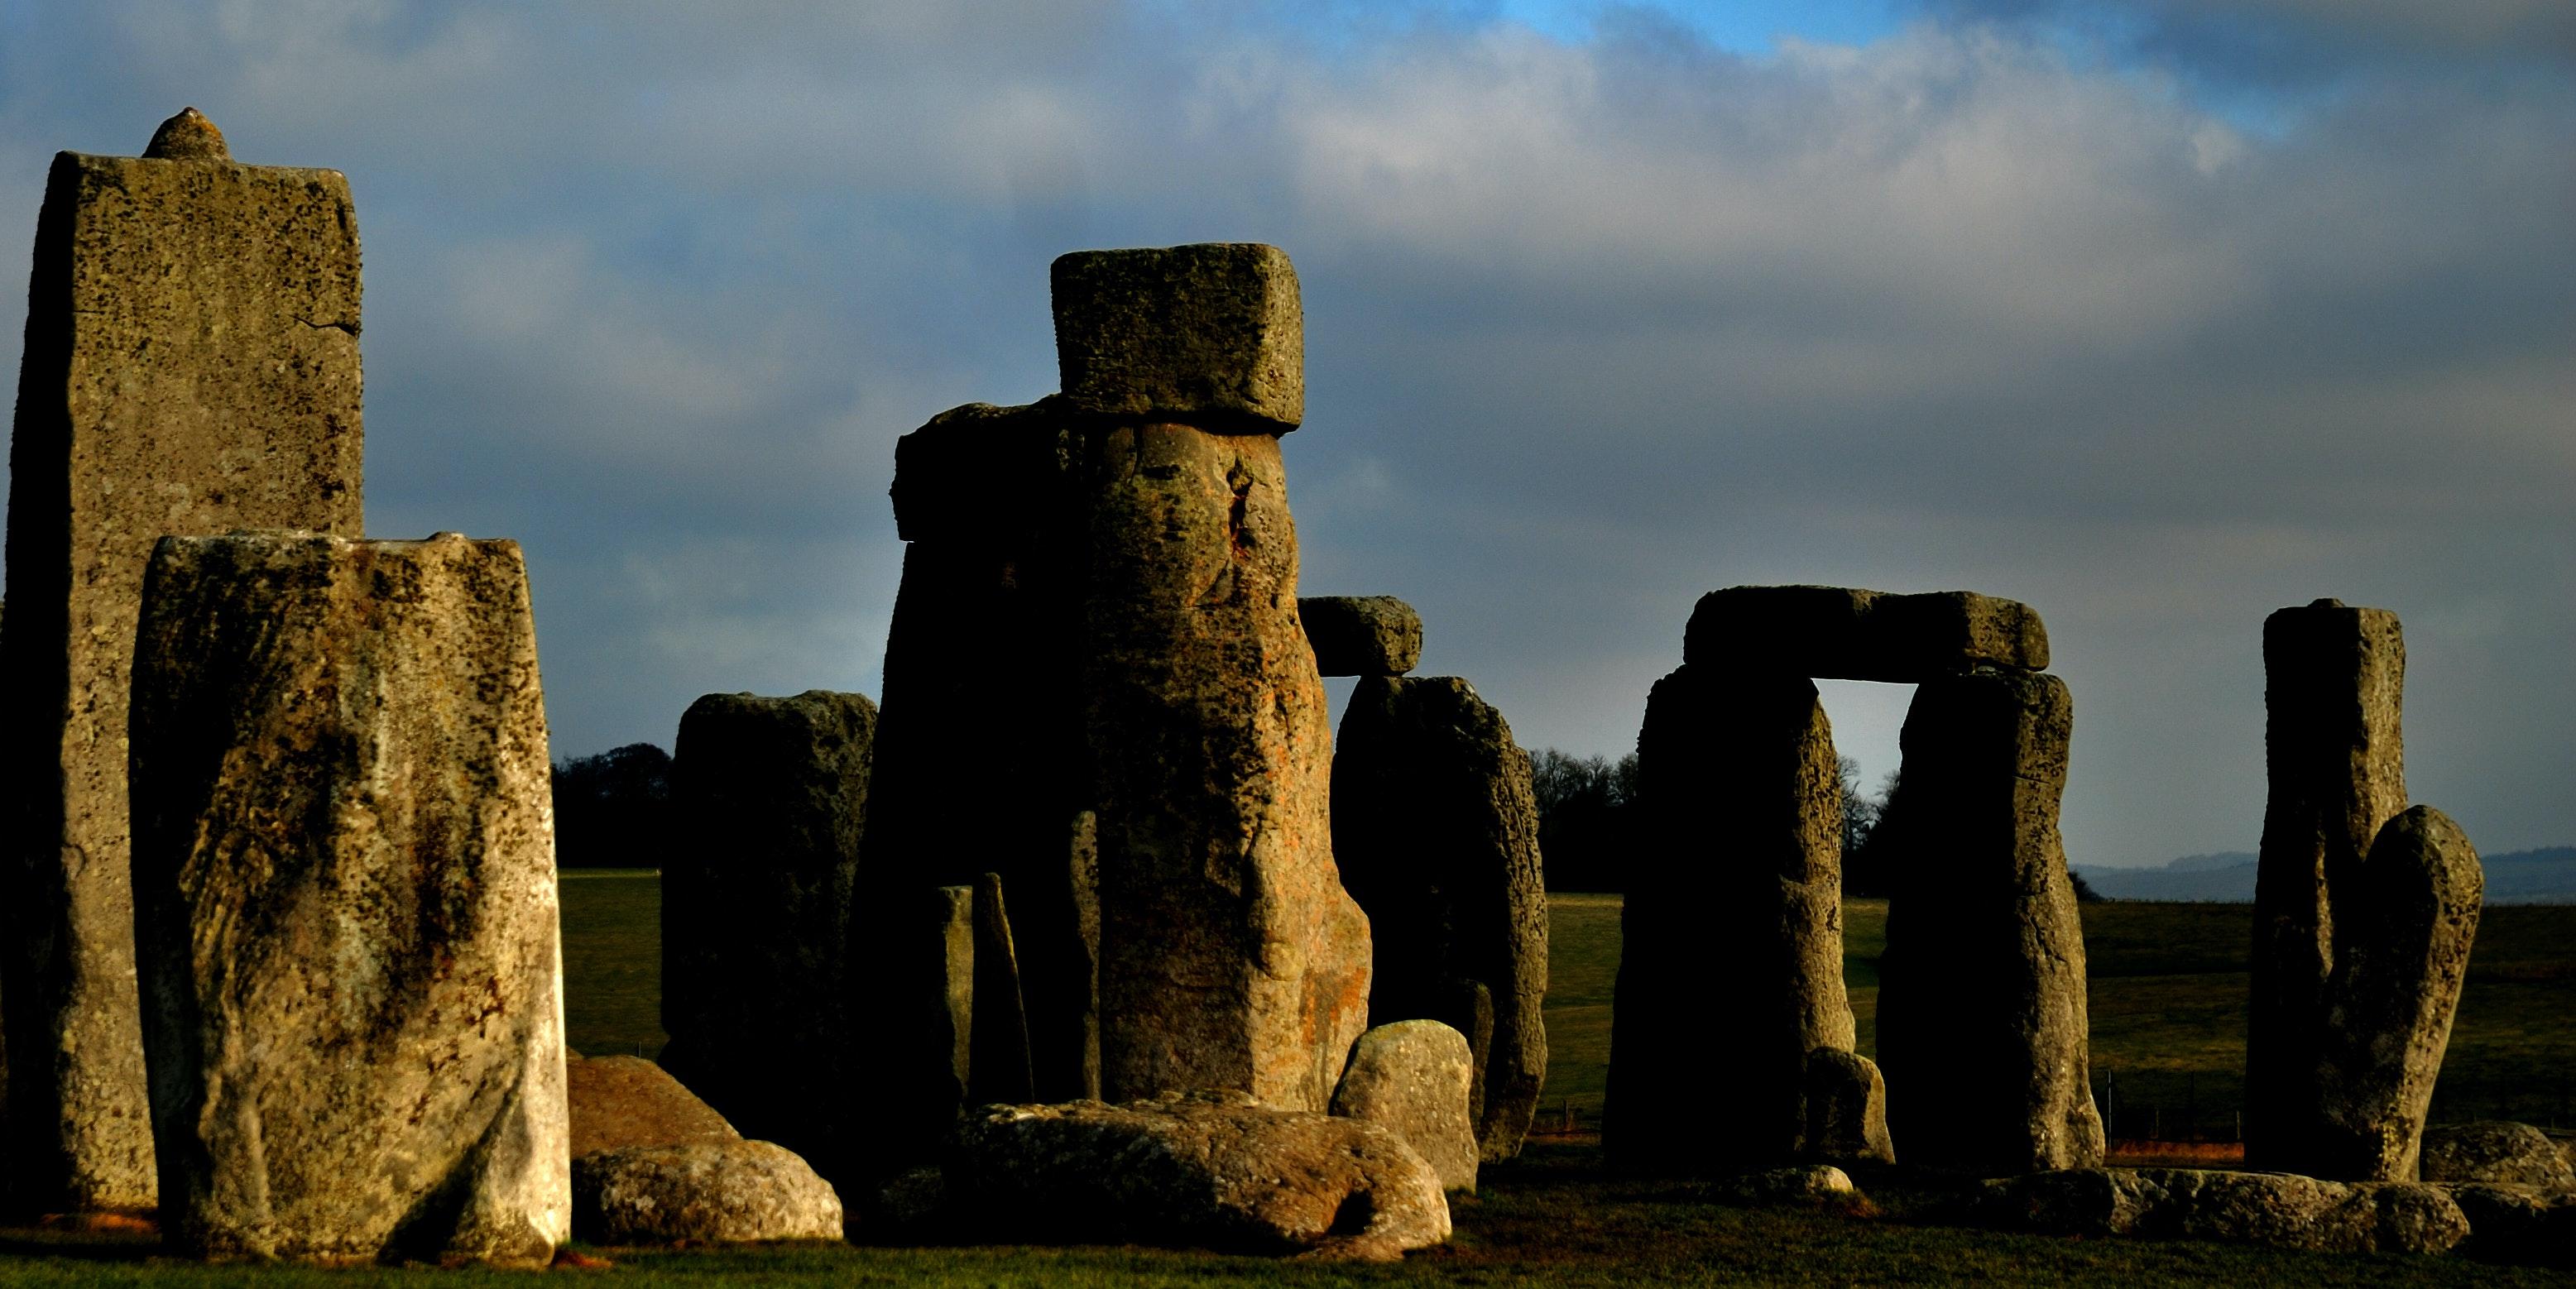 In DNA Survey of Ancient Europe, Stonehenge's Creators Unexpectedly Vanish